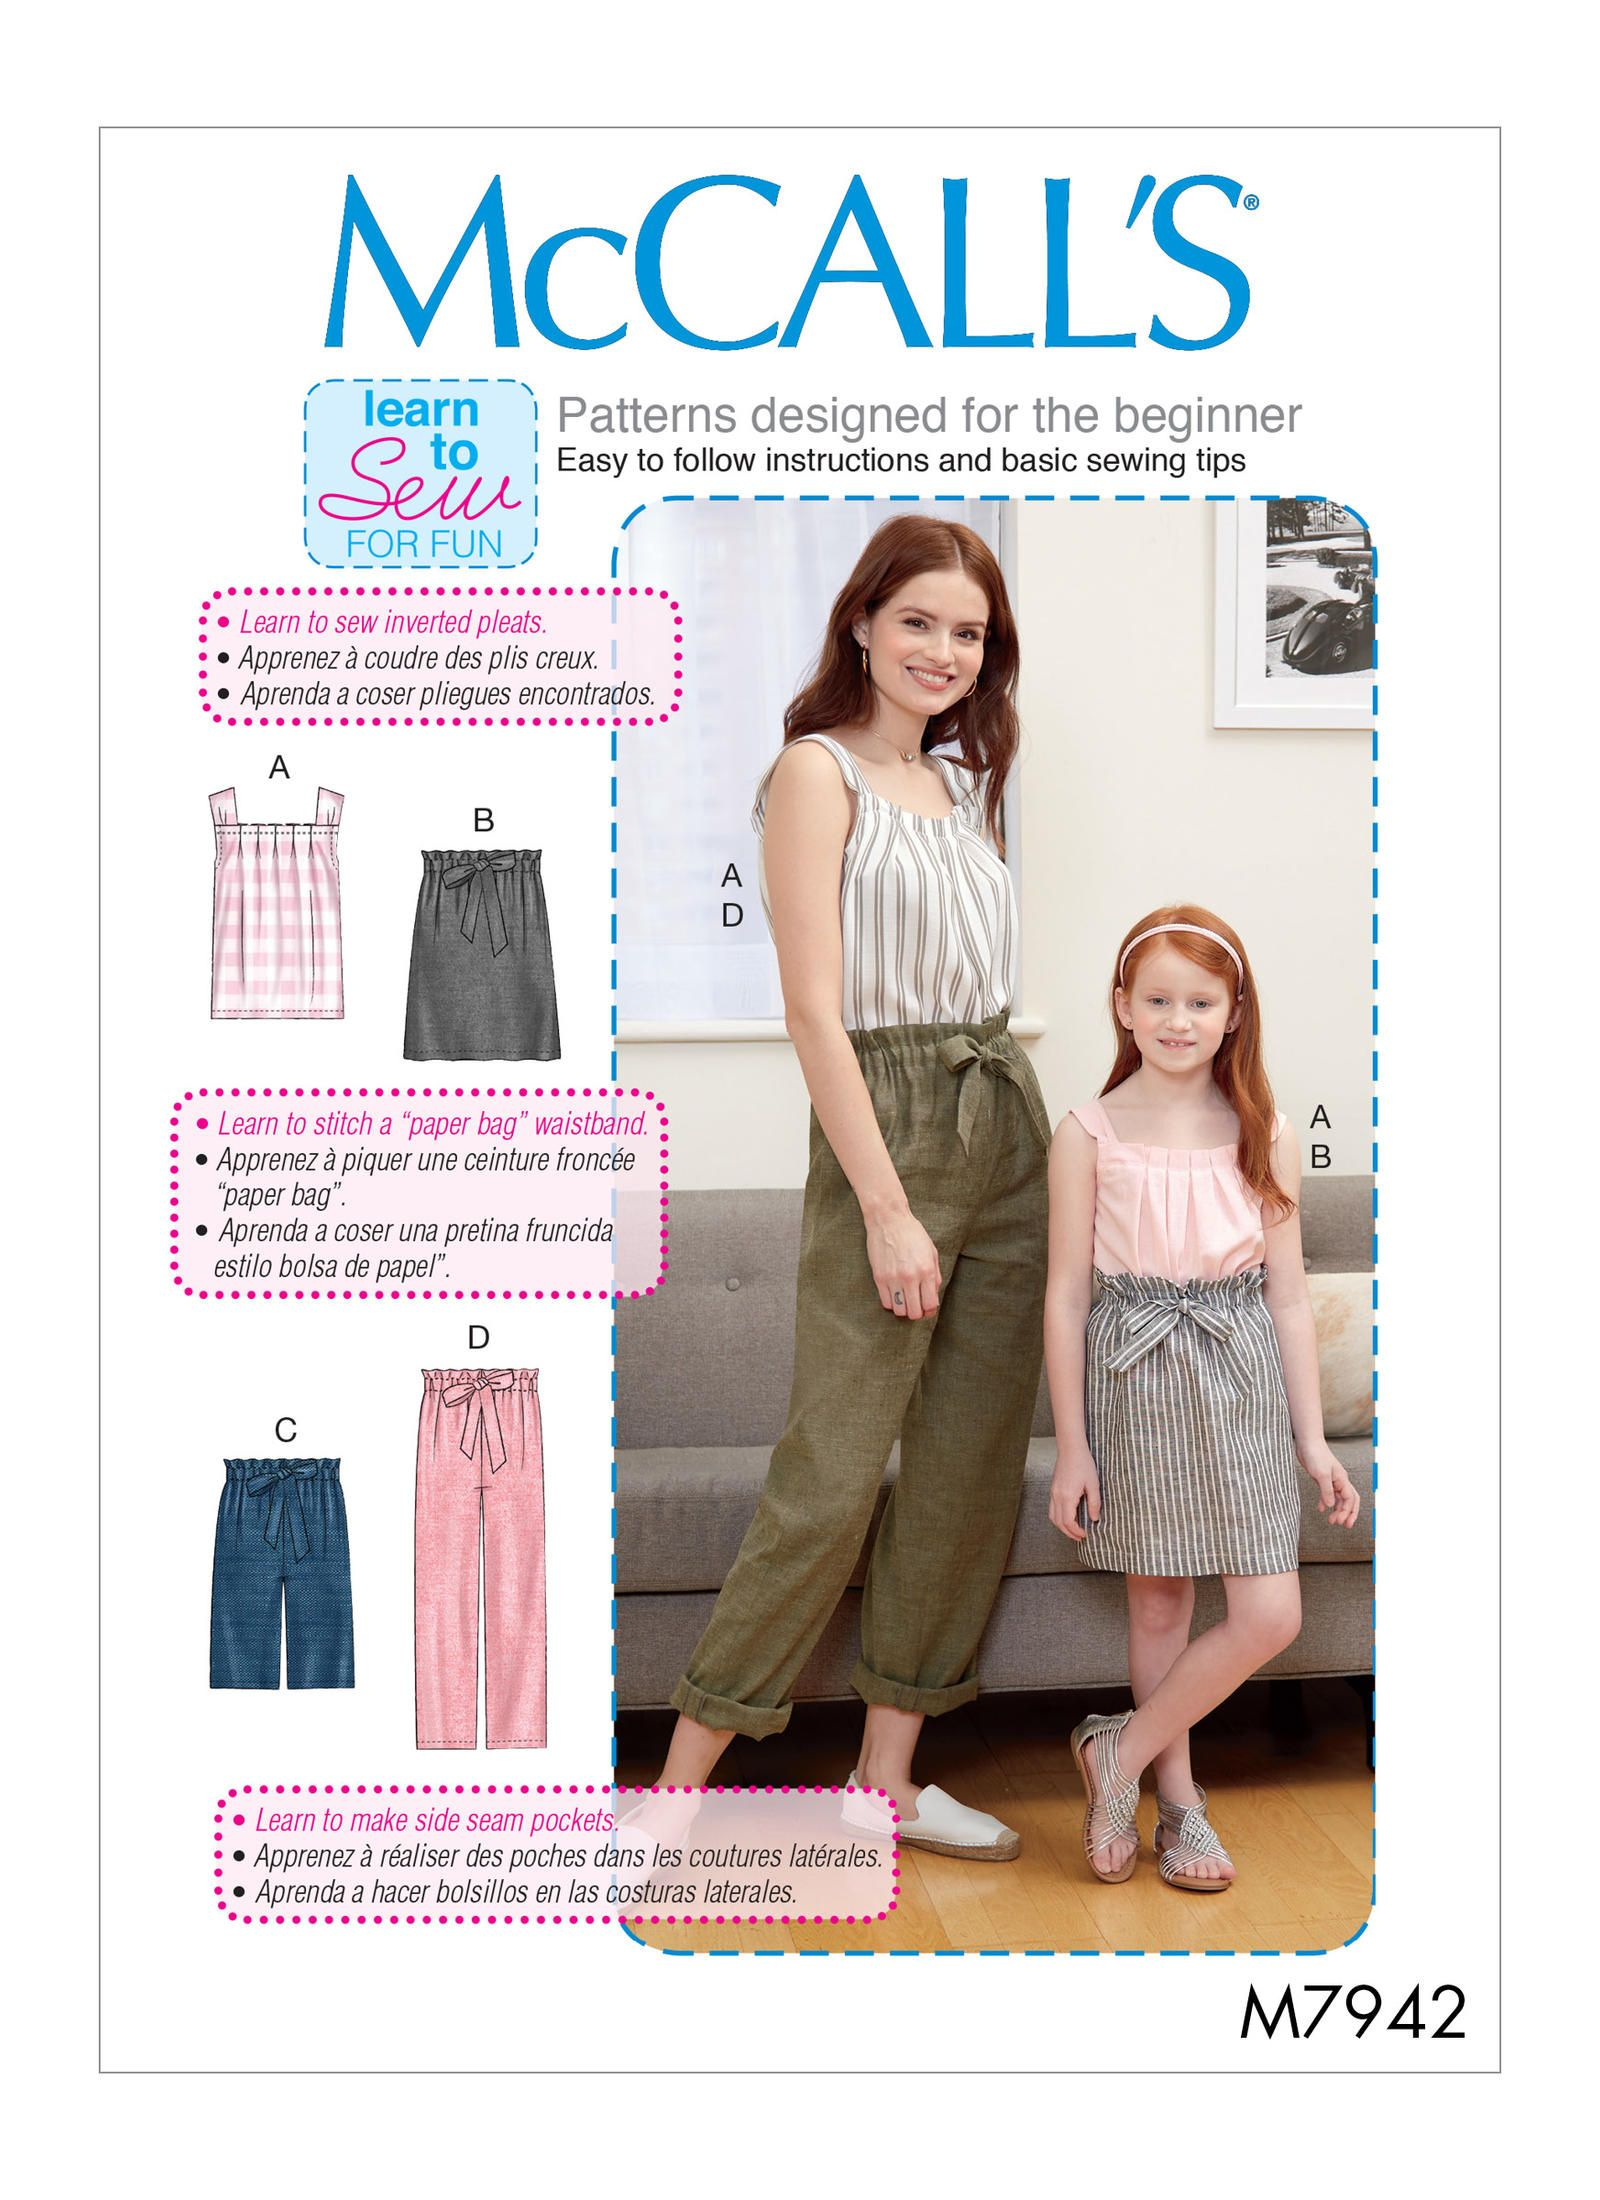 M7942 | Mccalls sewing patterns, Sewing patterns, Sewing